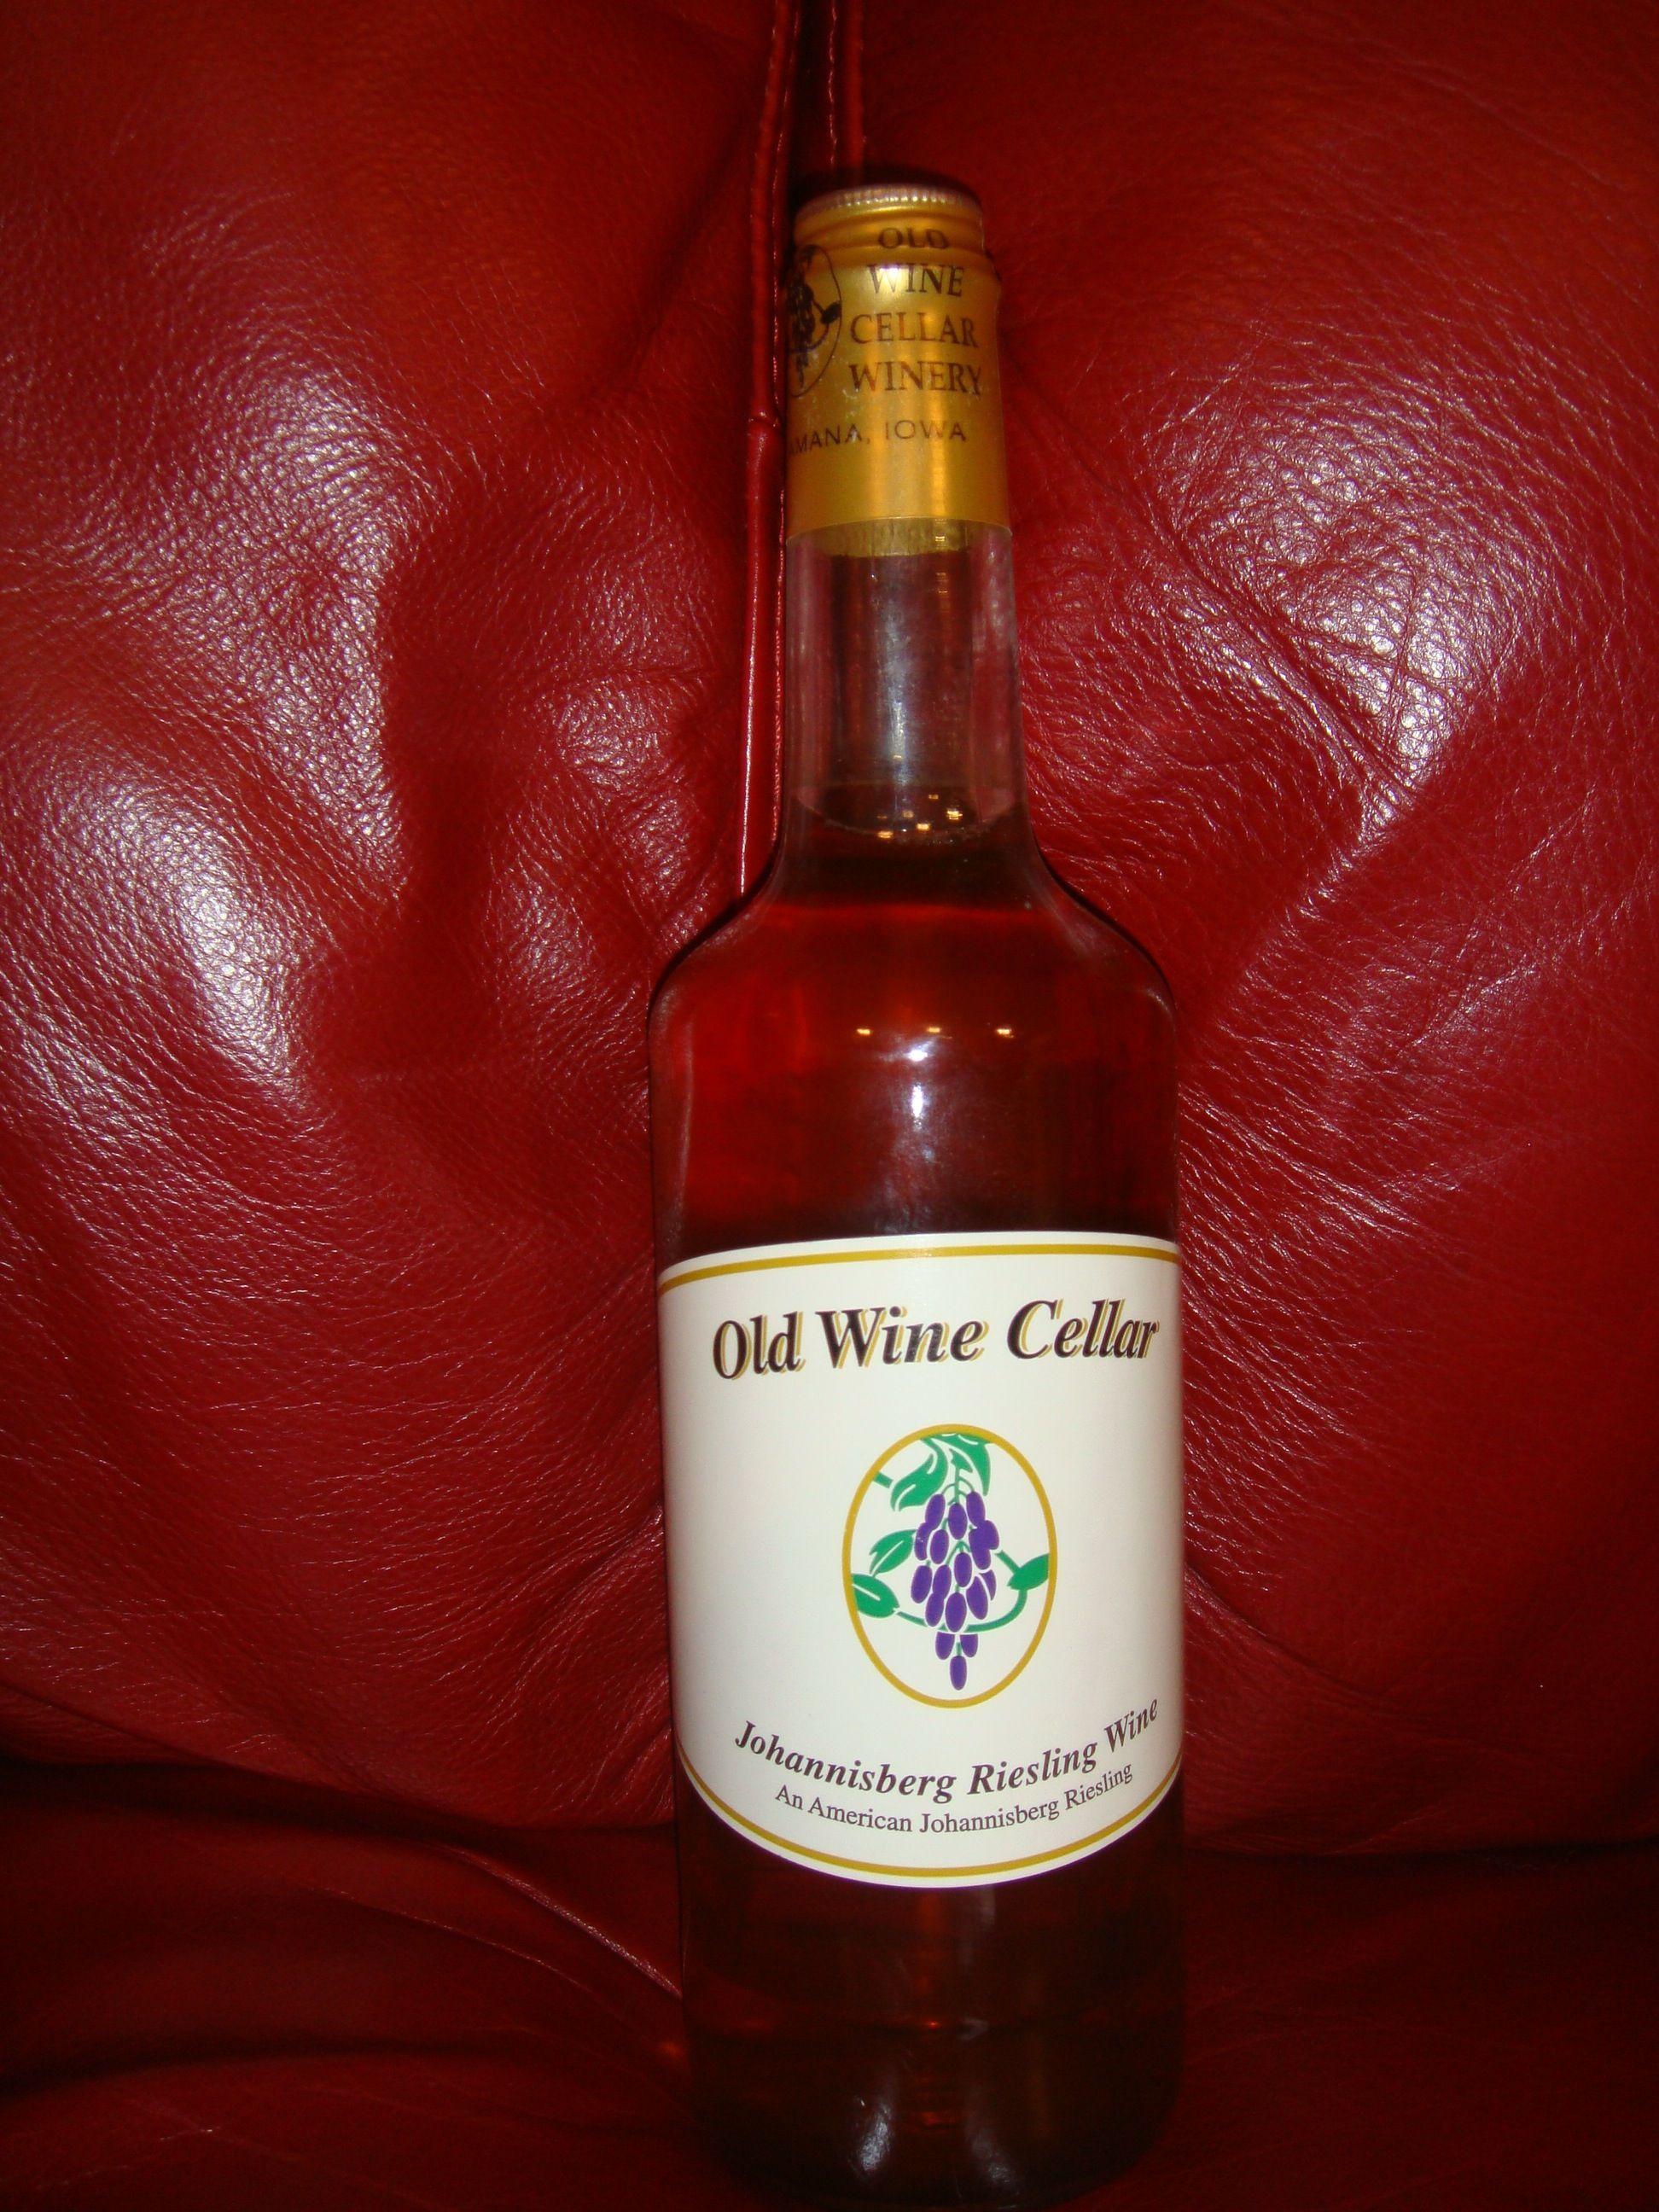 Johannisberg Riesling Wine By Old Wine Cellar Winery In Amana Ia Riesling Wine Wine Cellar Winery